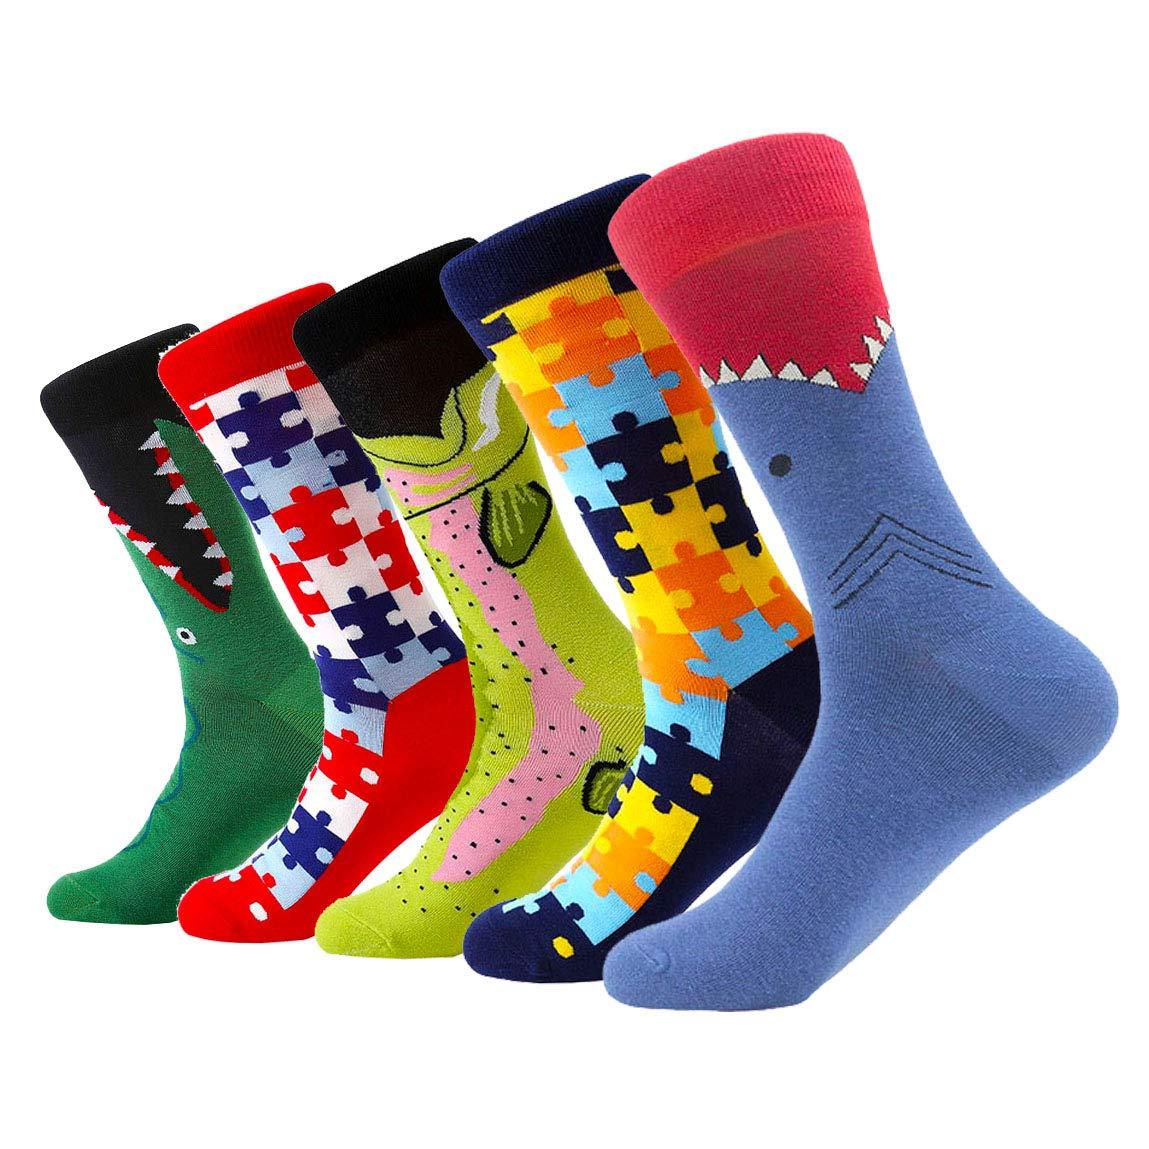 Mixsense Mens Fashion Dress Funny colorful Comfort Casual Cotton Crew Socks Pack